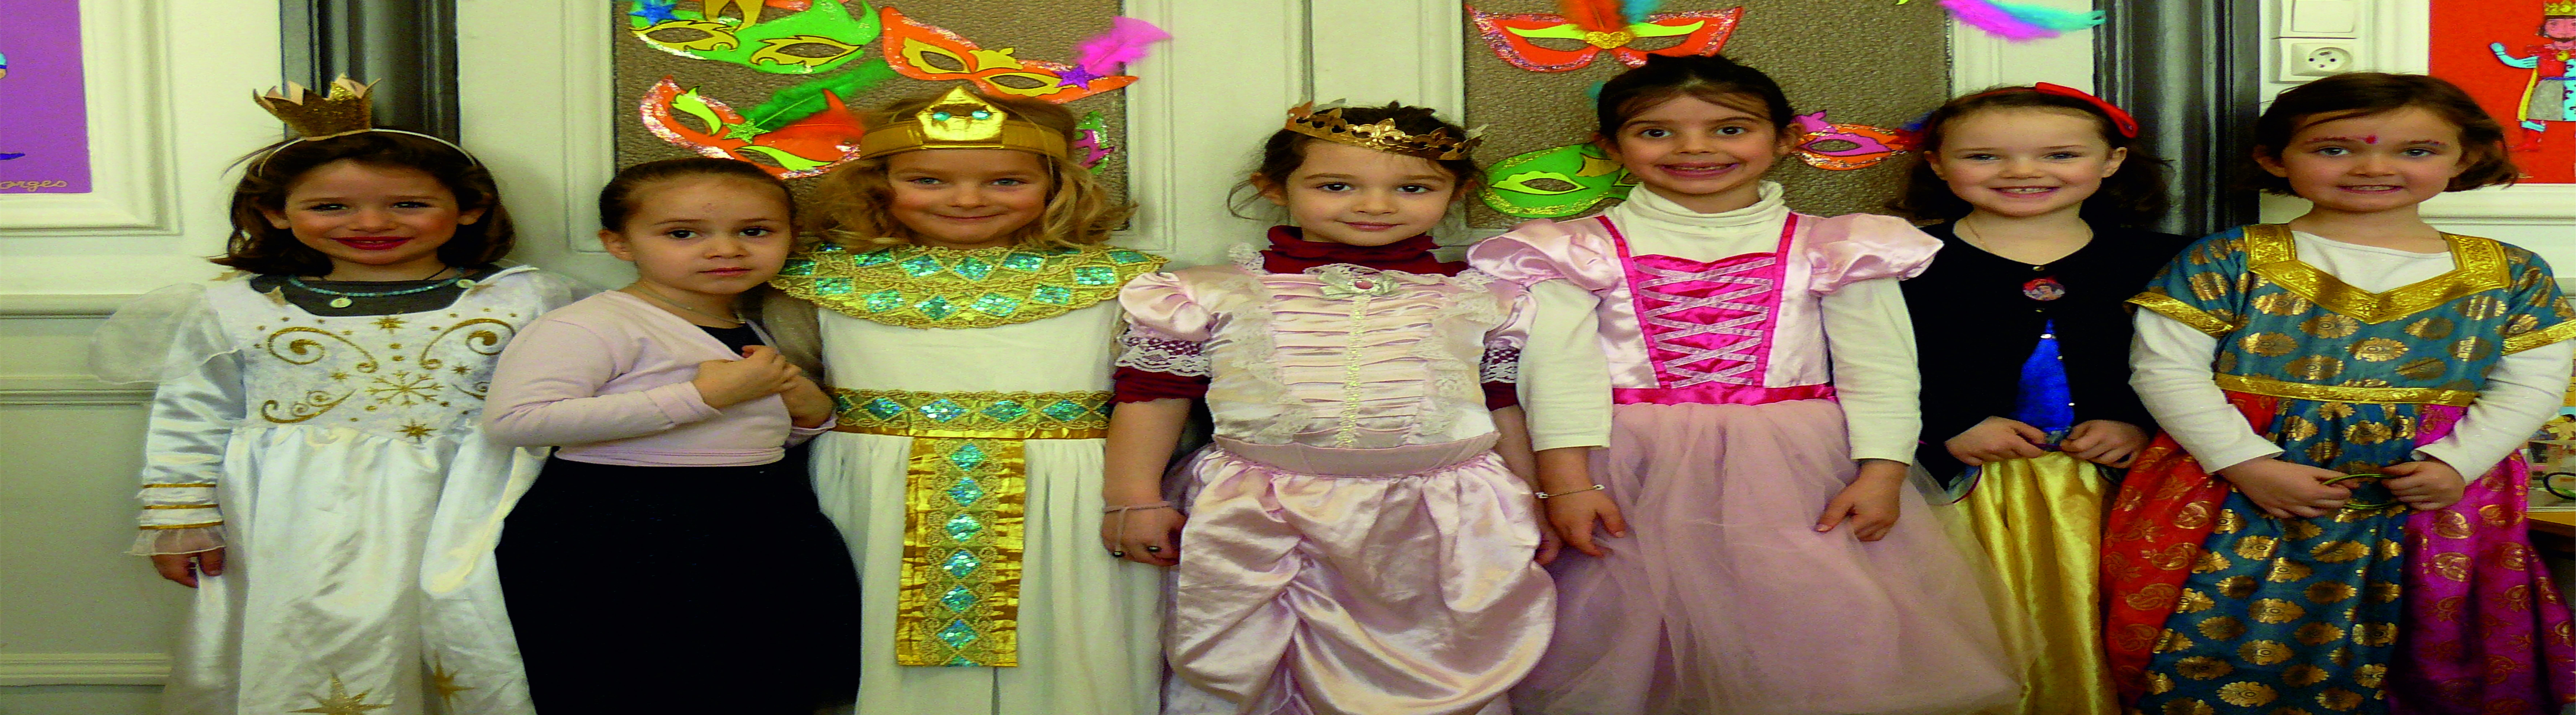 slider-carnaval